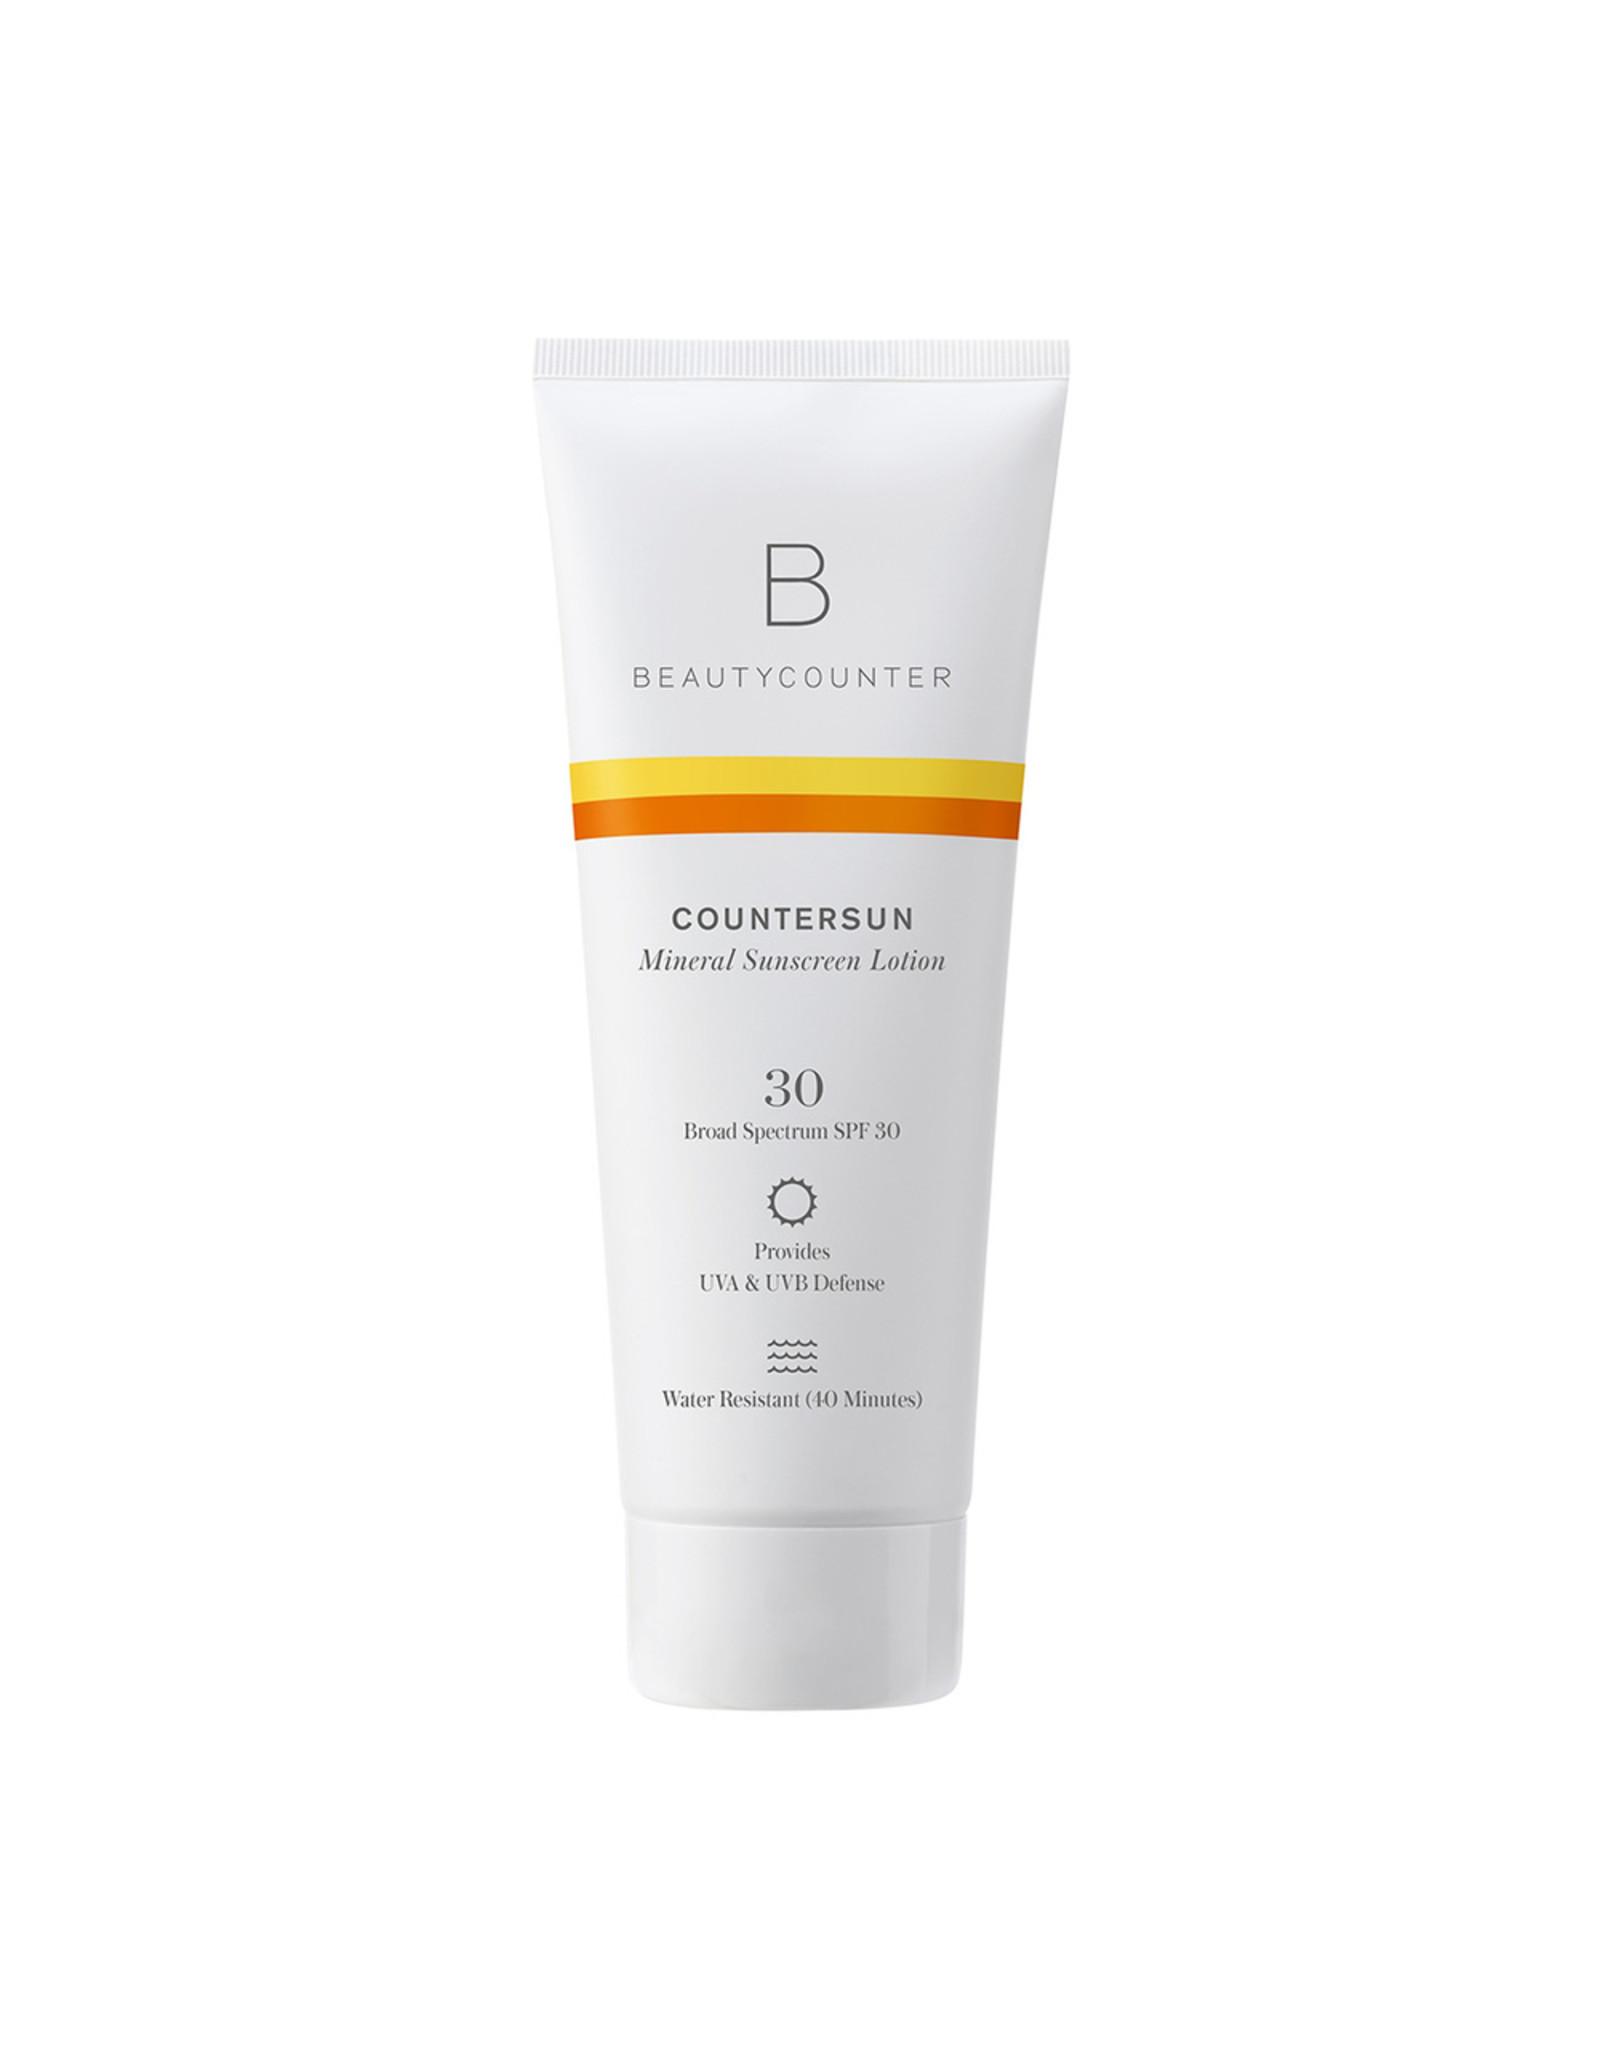 Beautycounter Beautycounter Countersun Mineral Sunscreen Lotion SPF 30